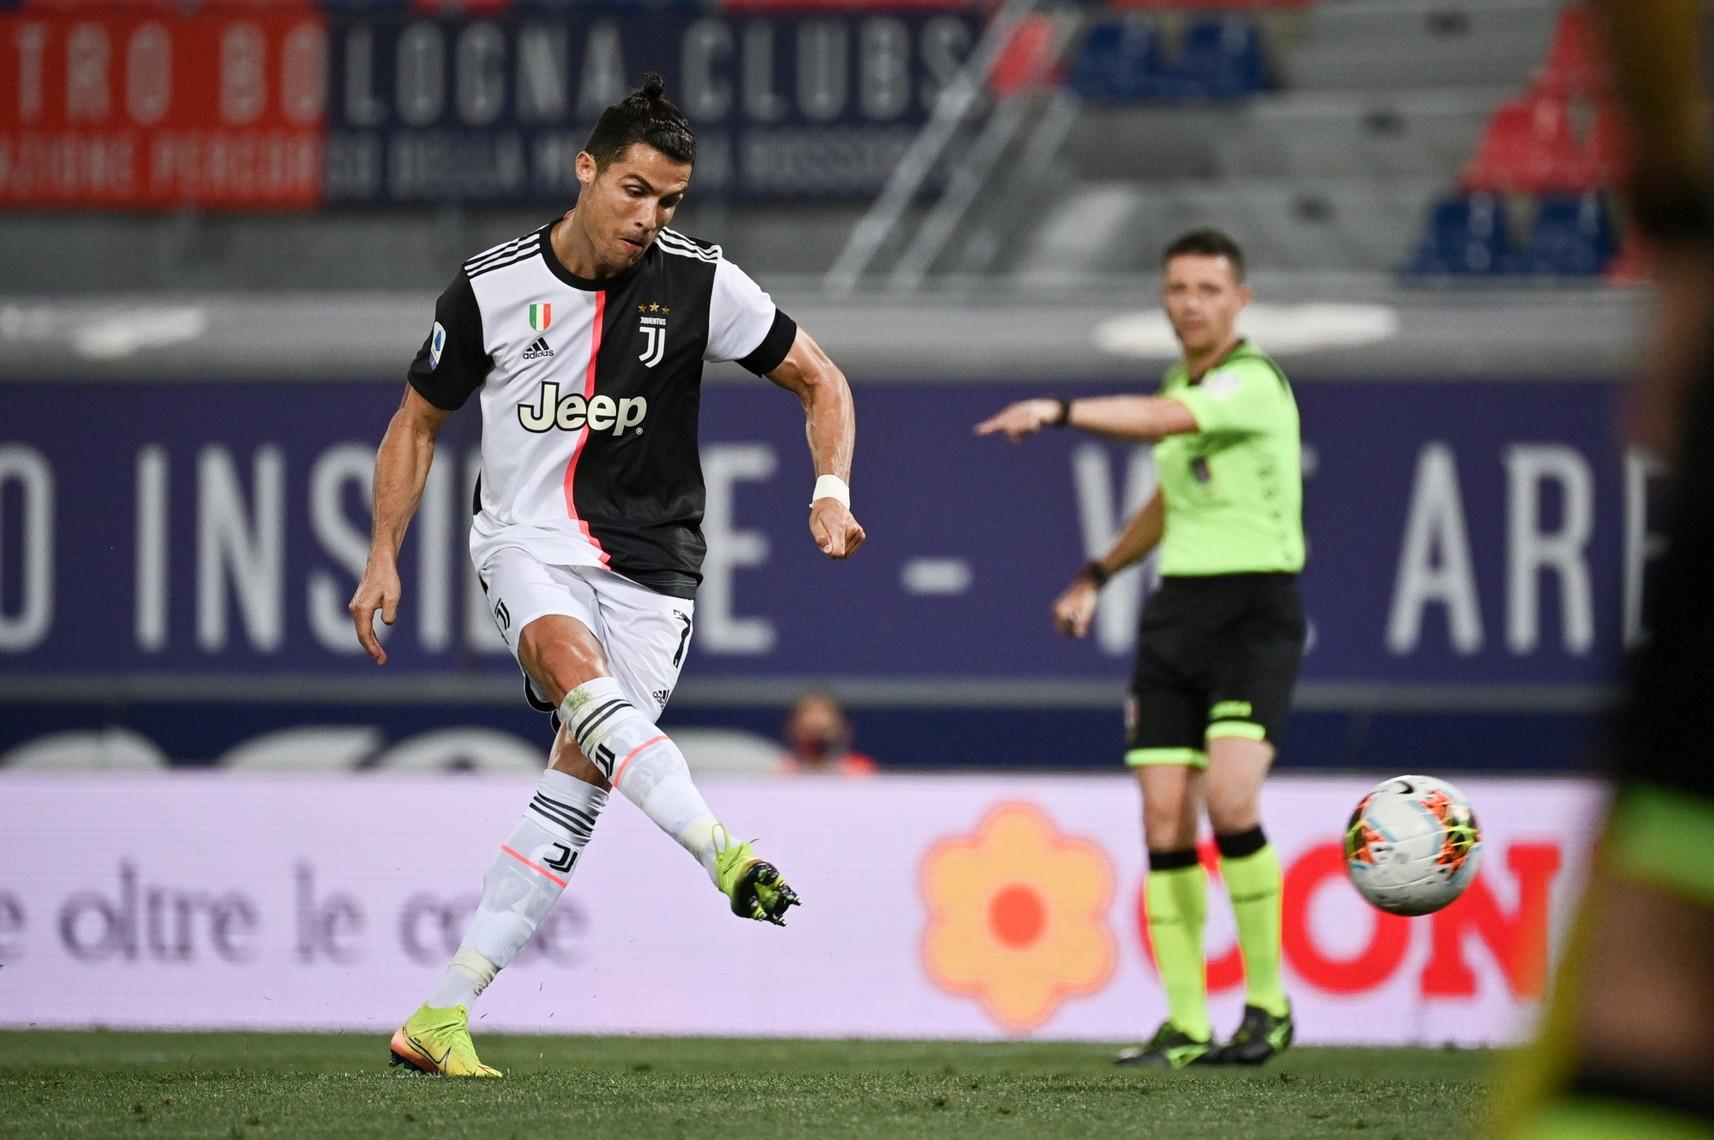 C罗在意大利杯半决赛对米兰时错失点球